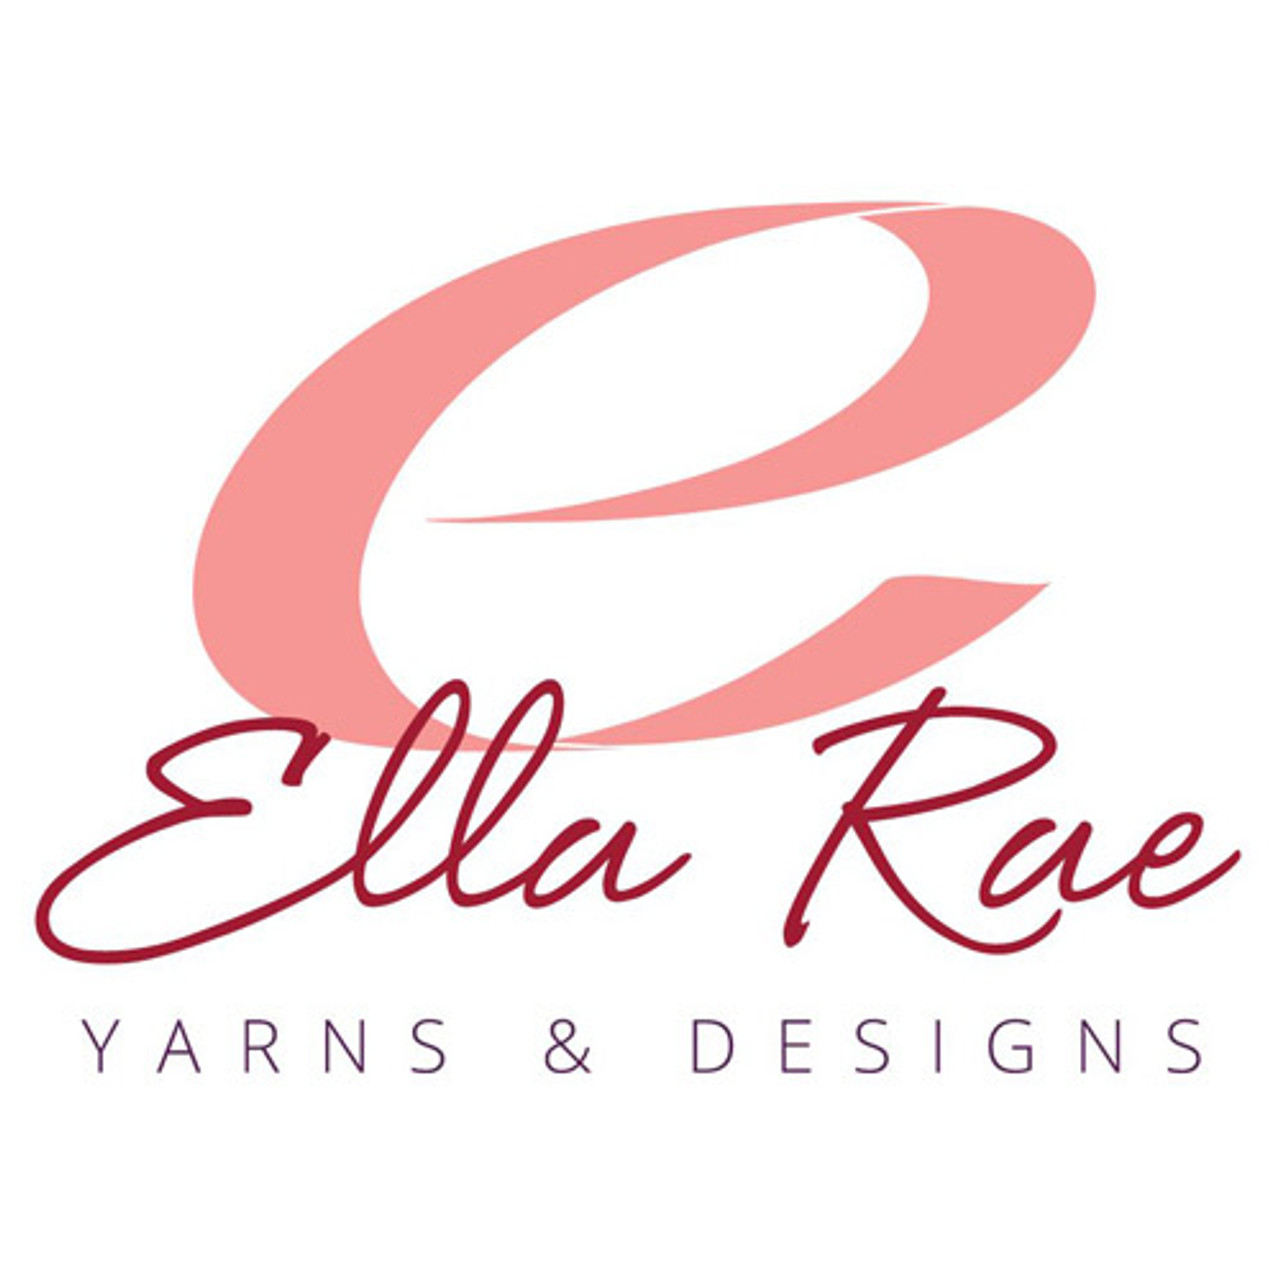 Ella Rae Yarns - Great quality and amazingly affordable